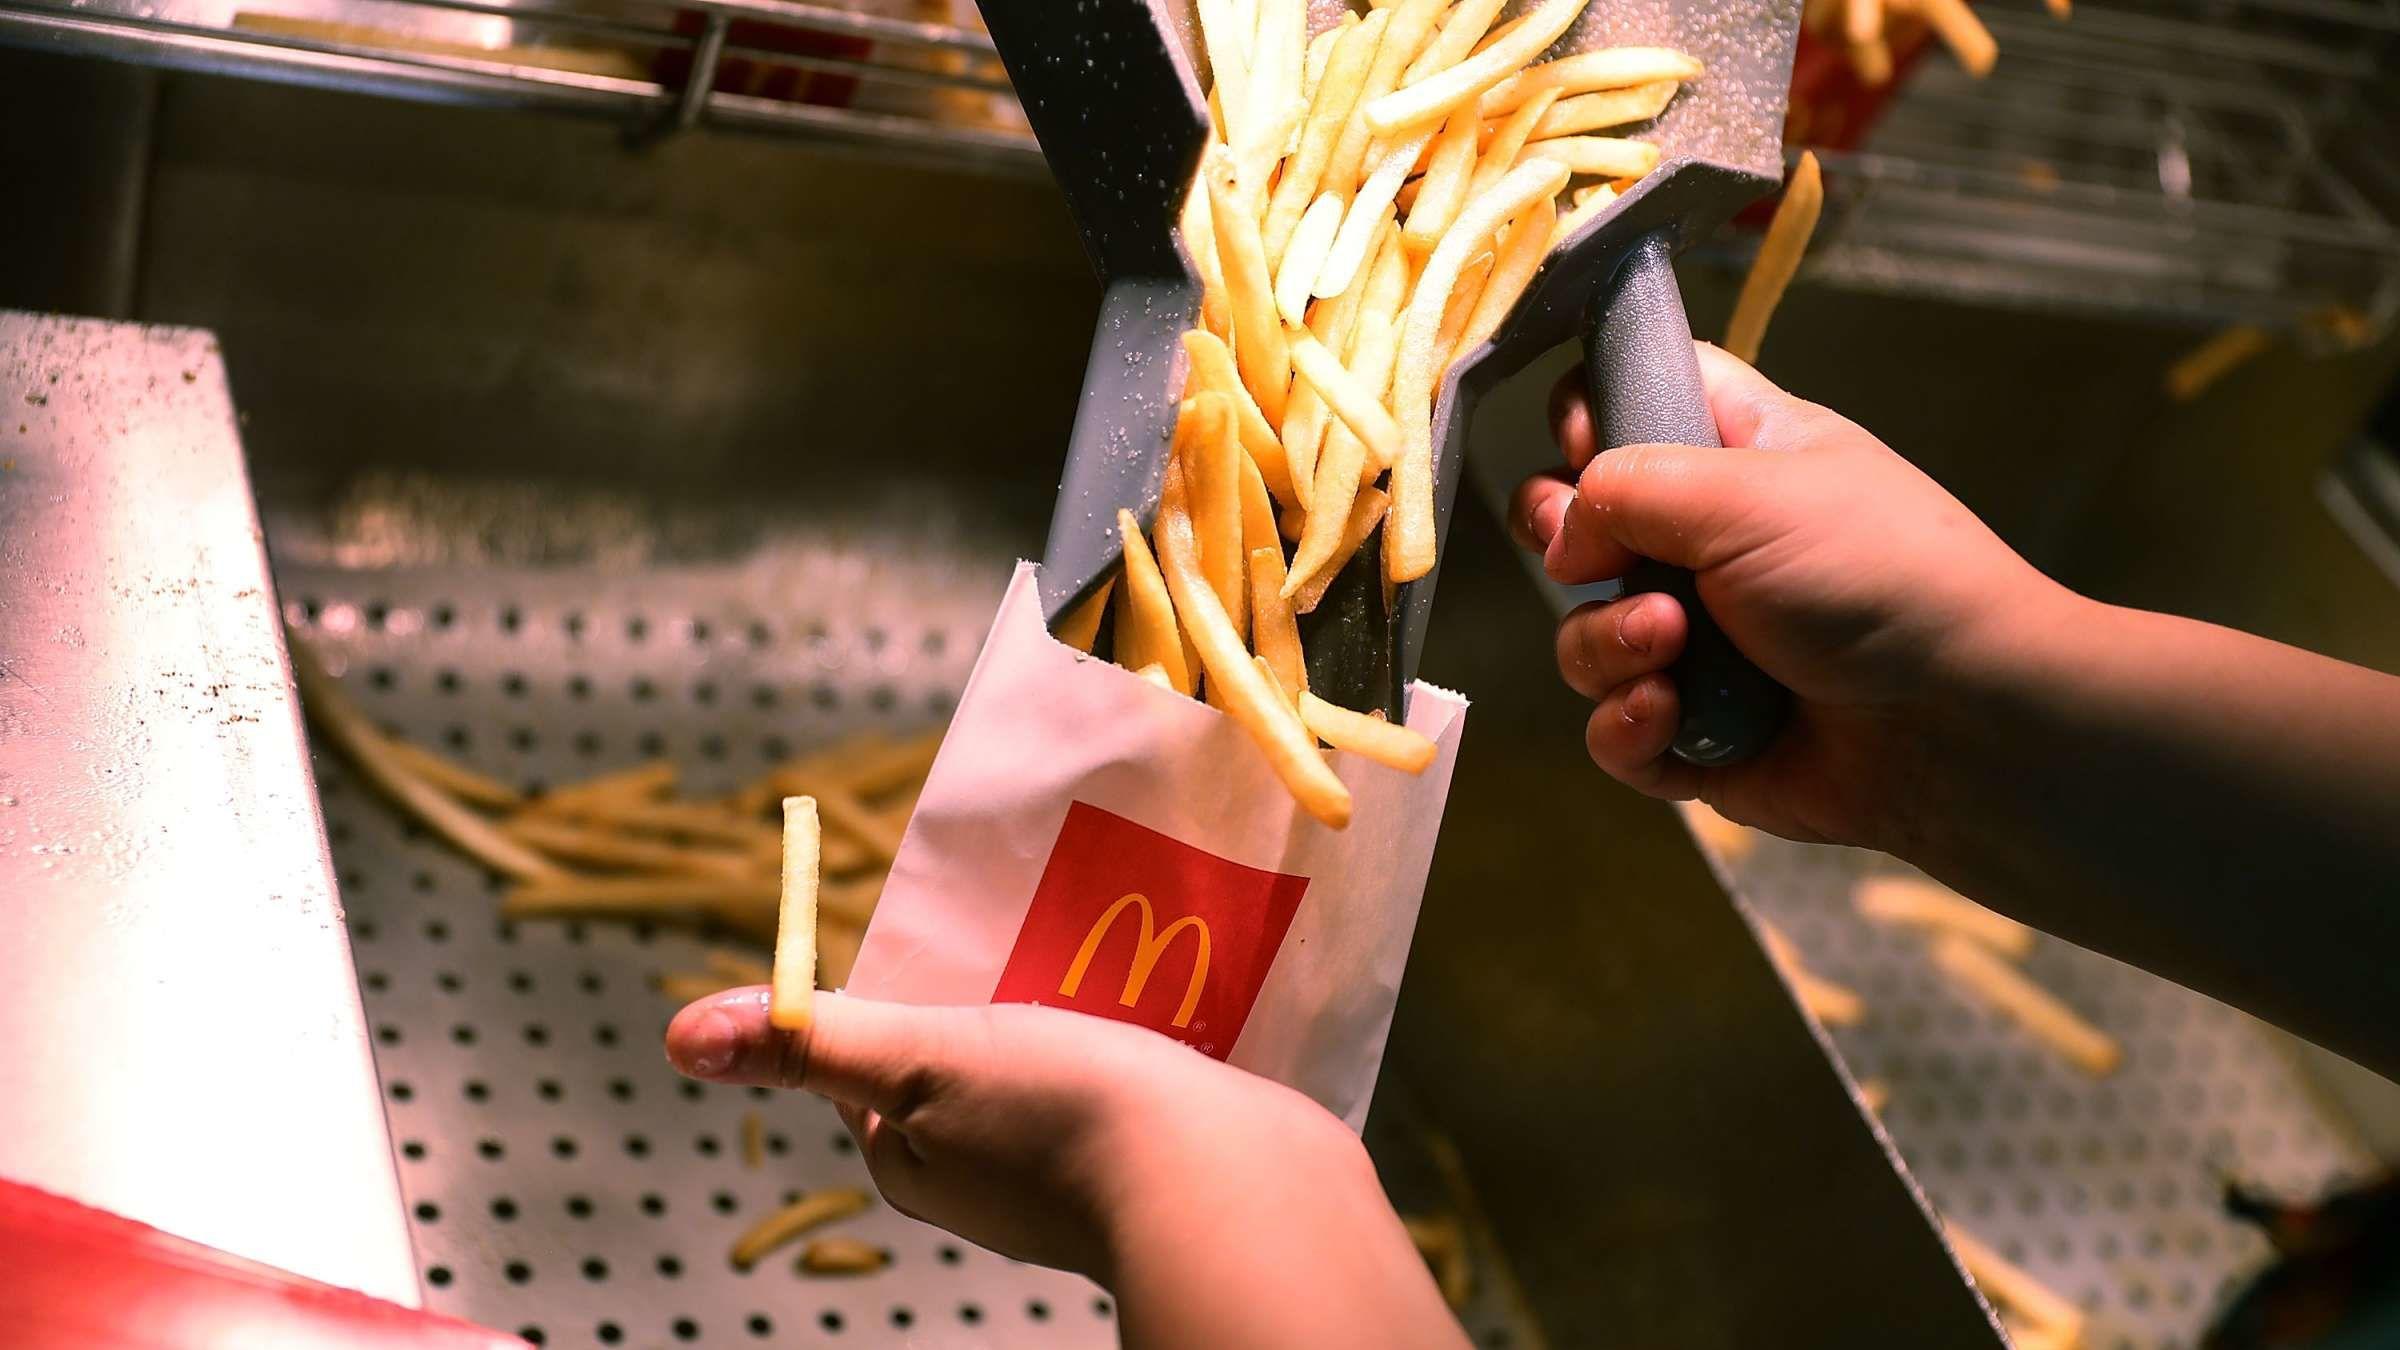 McDonald's Free Fry Refills Are Their Best-Kept Secret